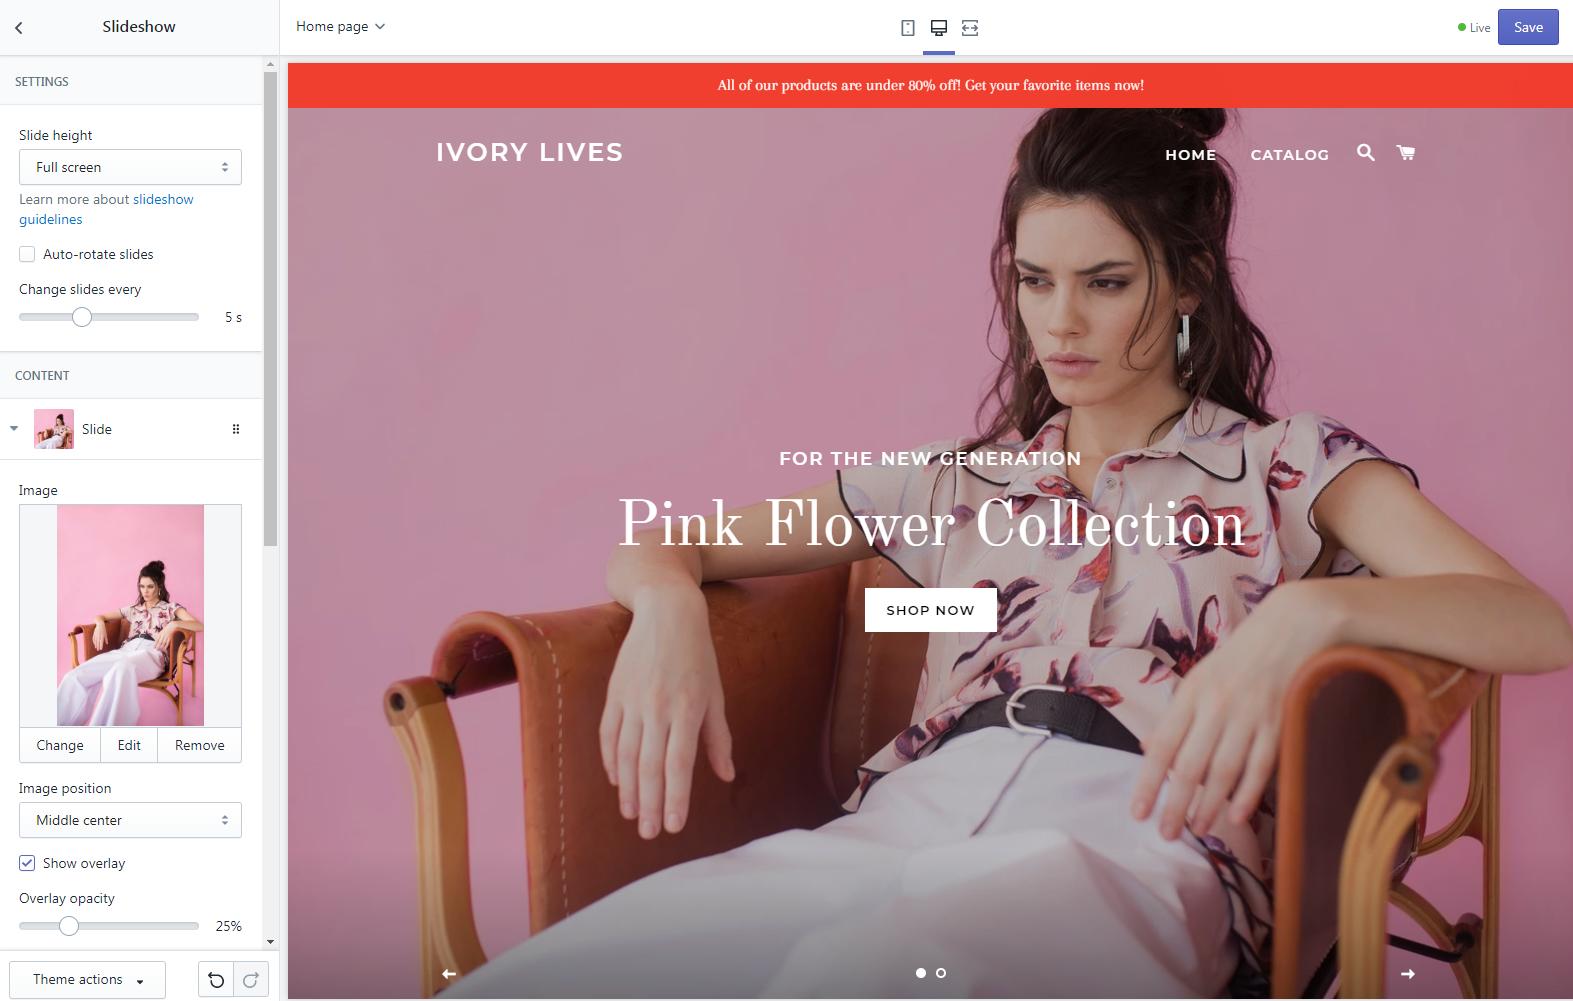 Shopify Theme Customization: Designing Shopify Store 101